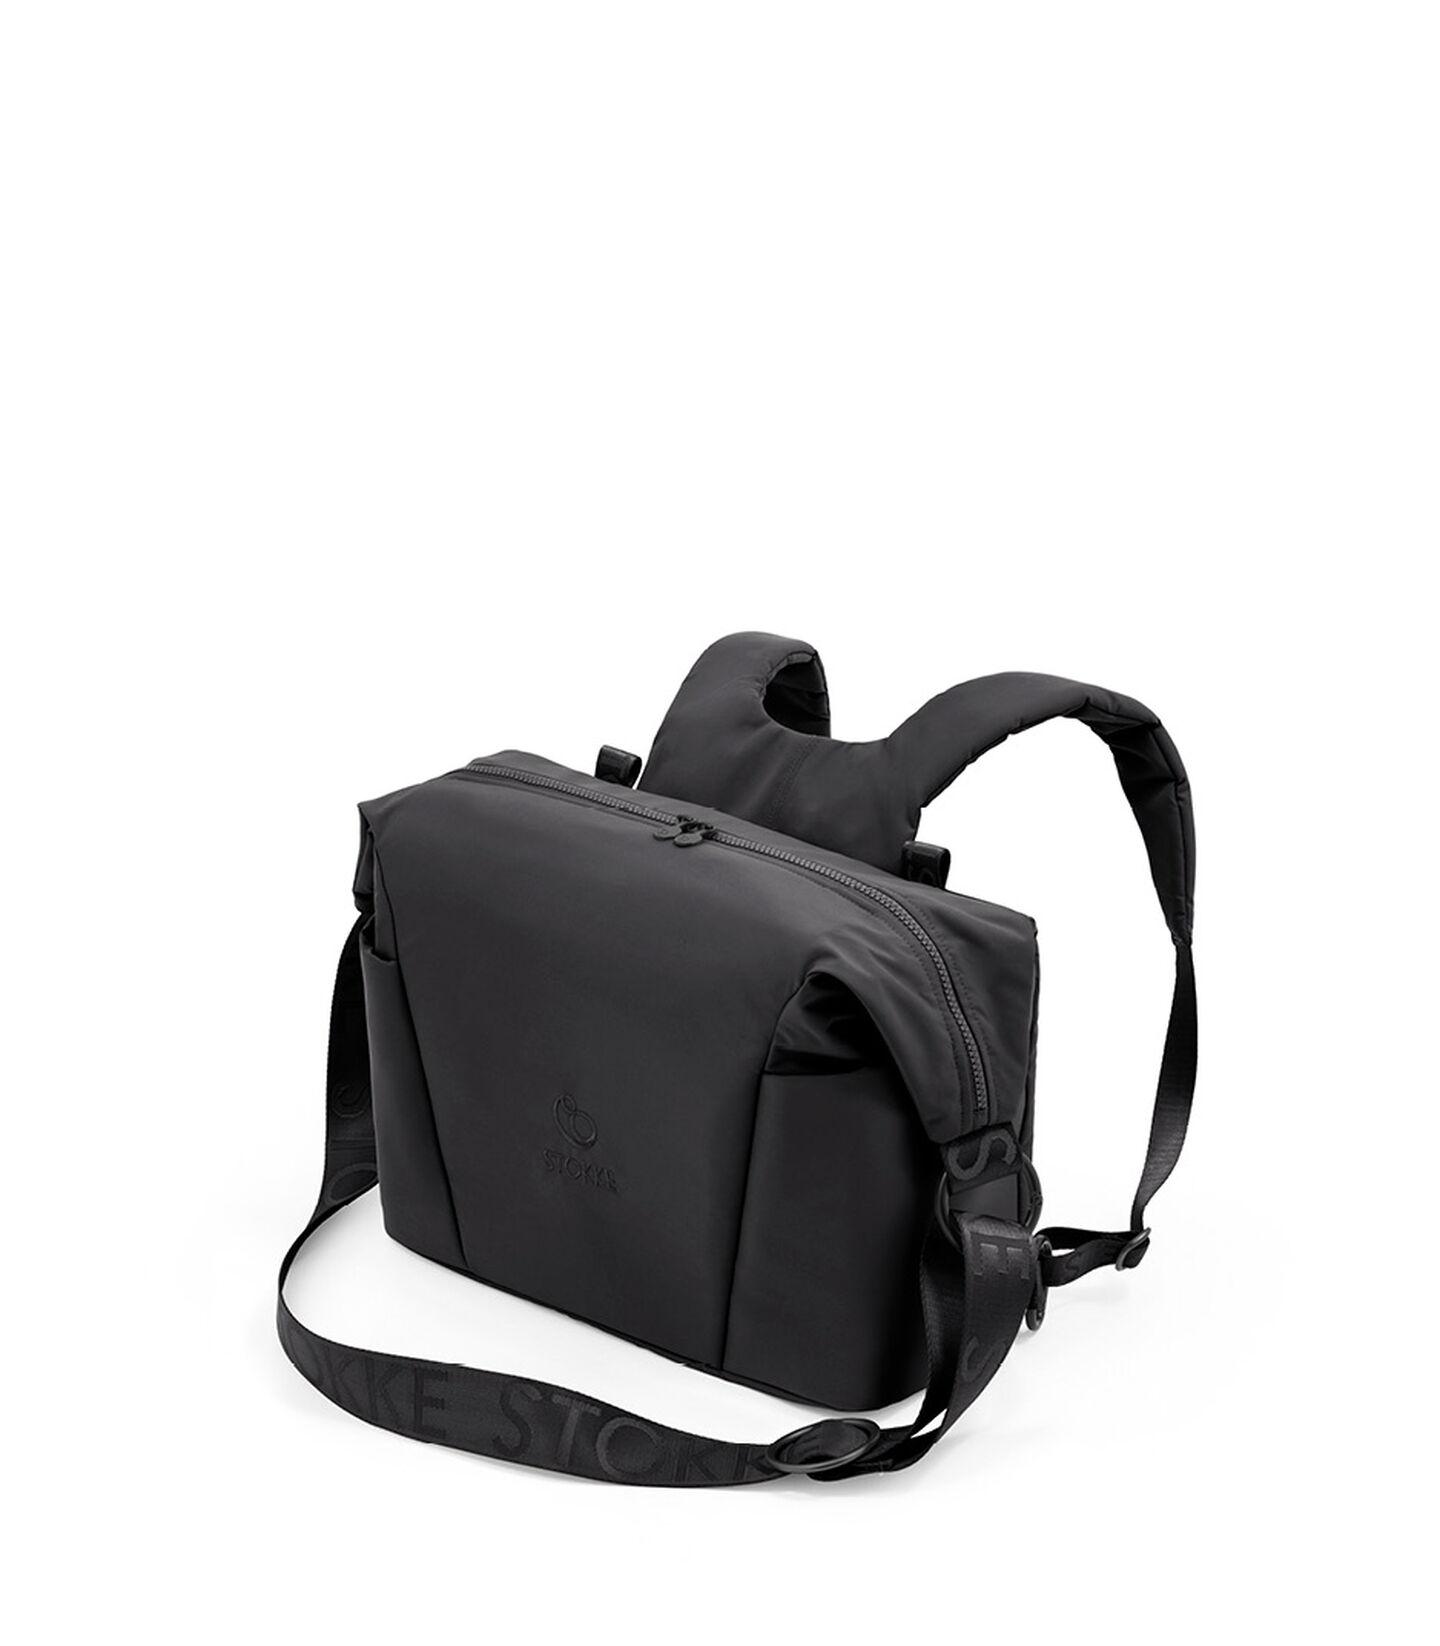 Stokke® Xplory® X Changing bag Rich Black, Nero Intenso, mainview view 2